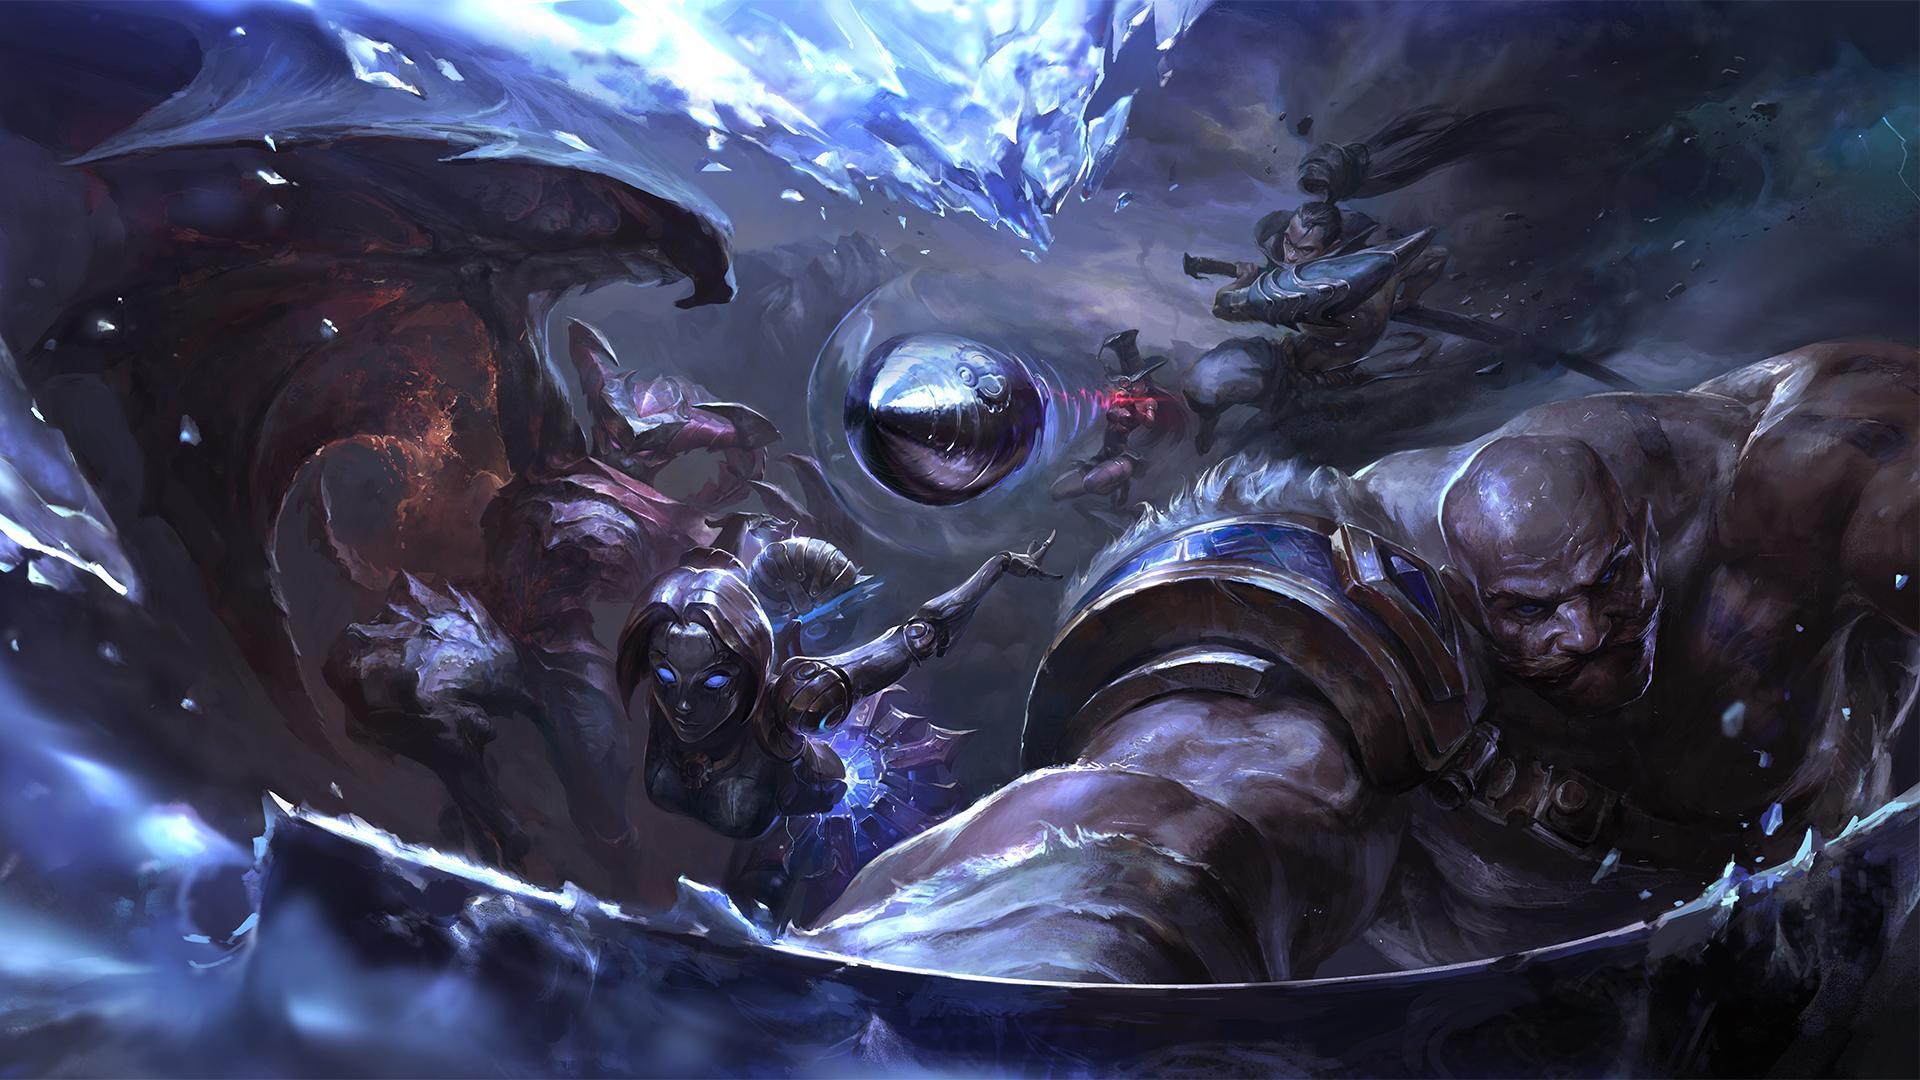 League of Legends Season 6 wallpaper